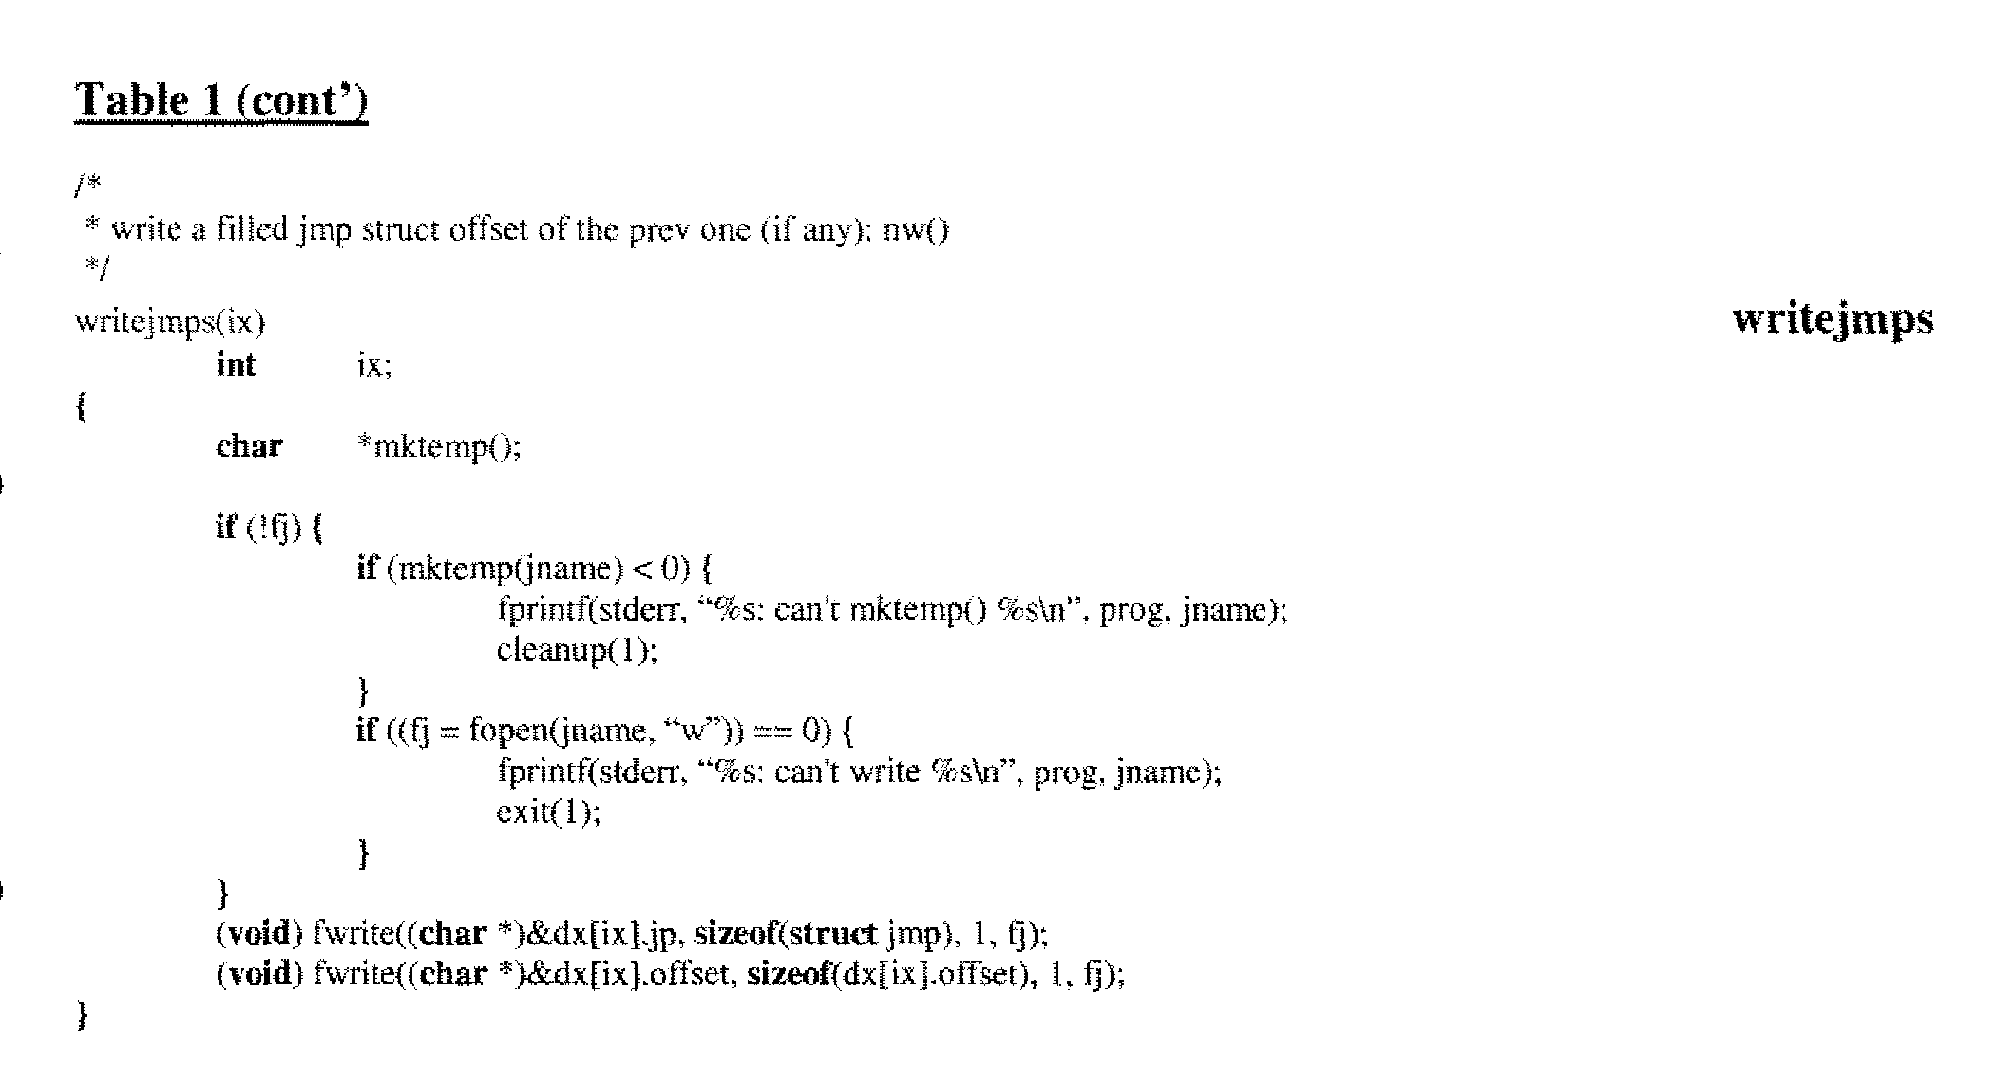 Welt der Panzer Matchmaking Tabelle 9.6